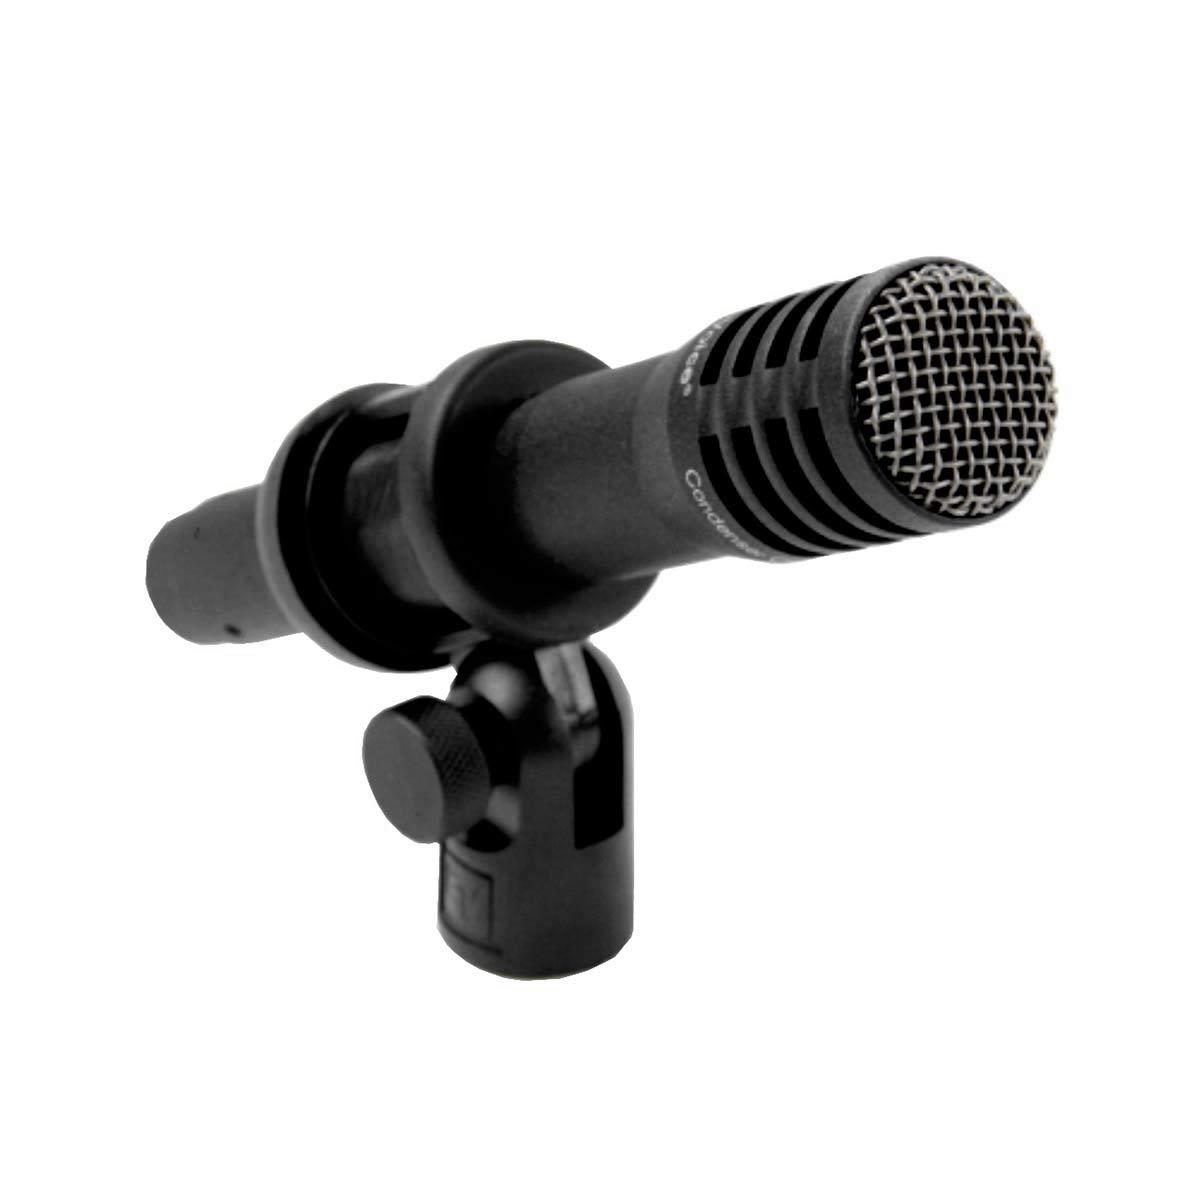 Microfone c/ Fio Condensador p/ Intrumentos - PL 37 Electro-Voice